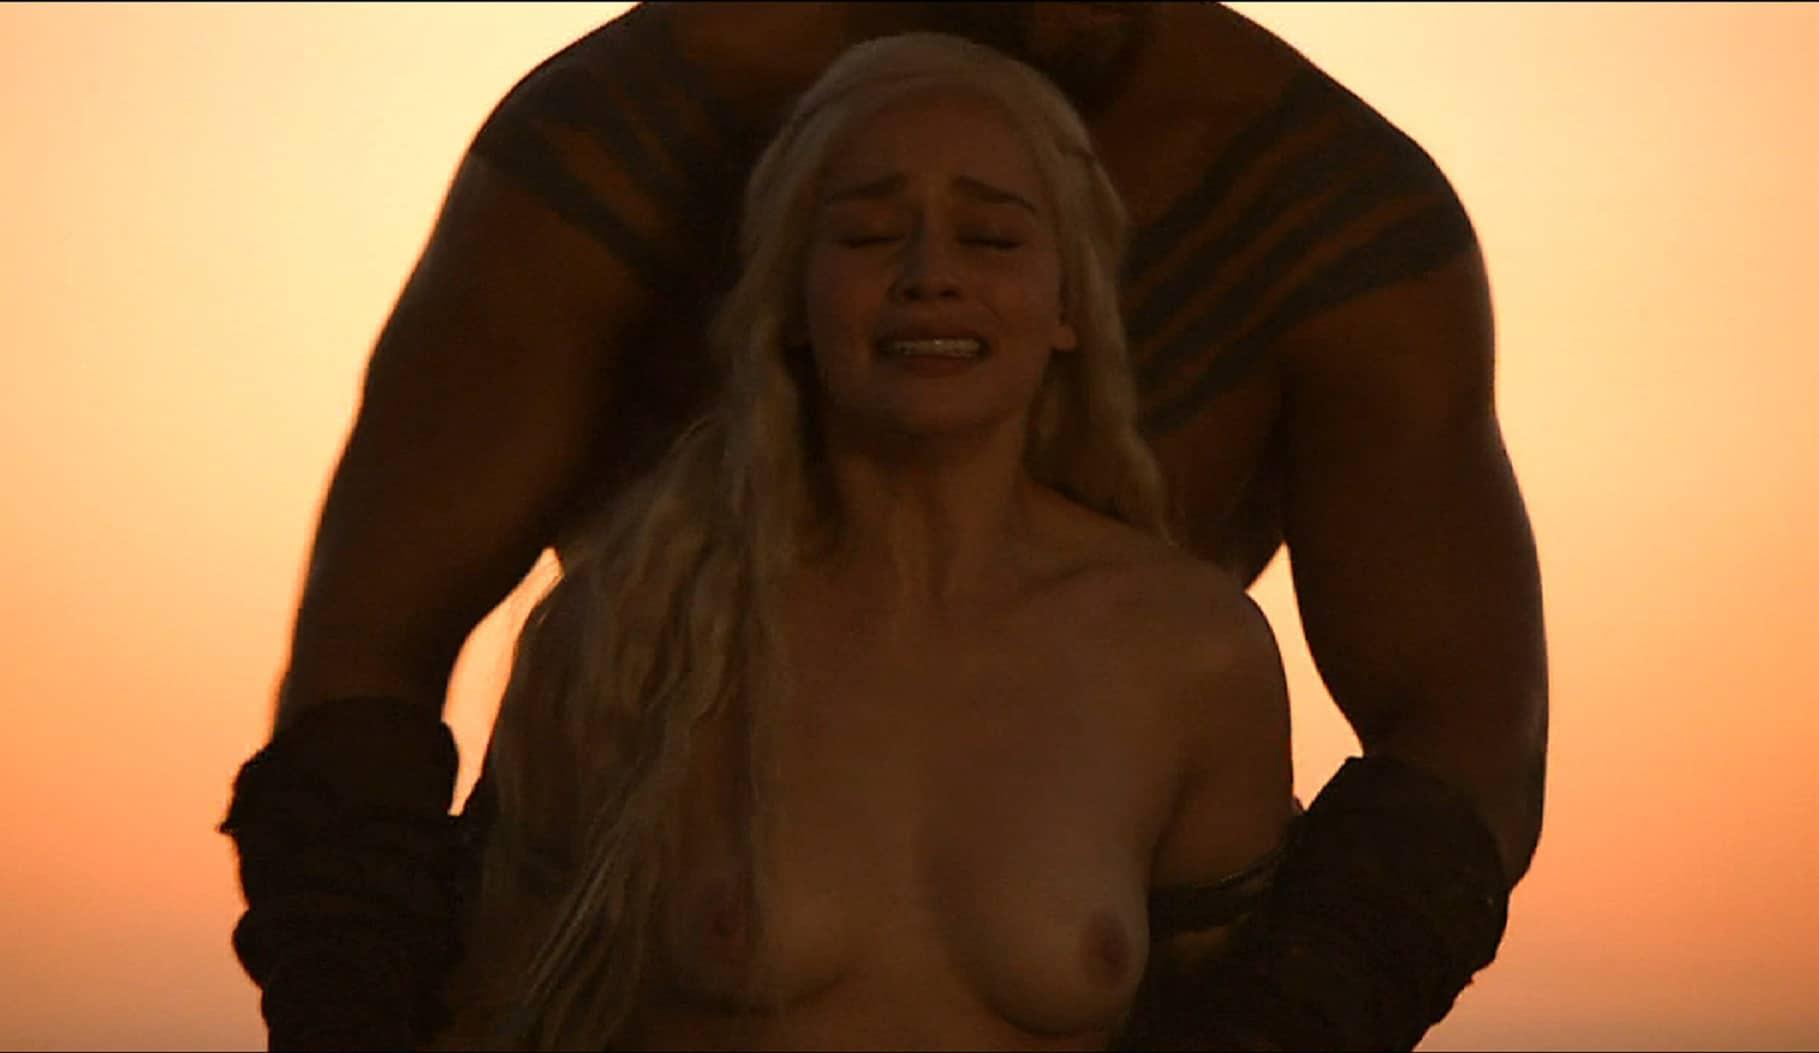 celeb emilia clarke nude pic of her getting fucked